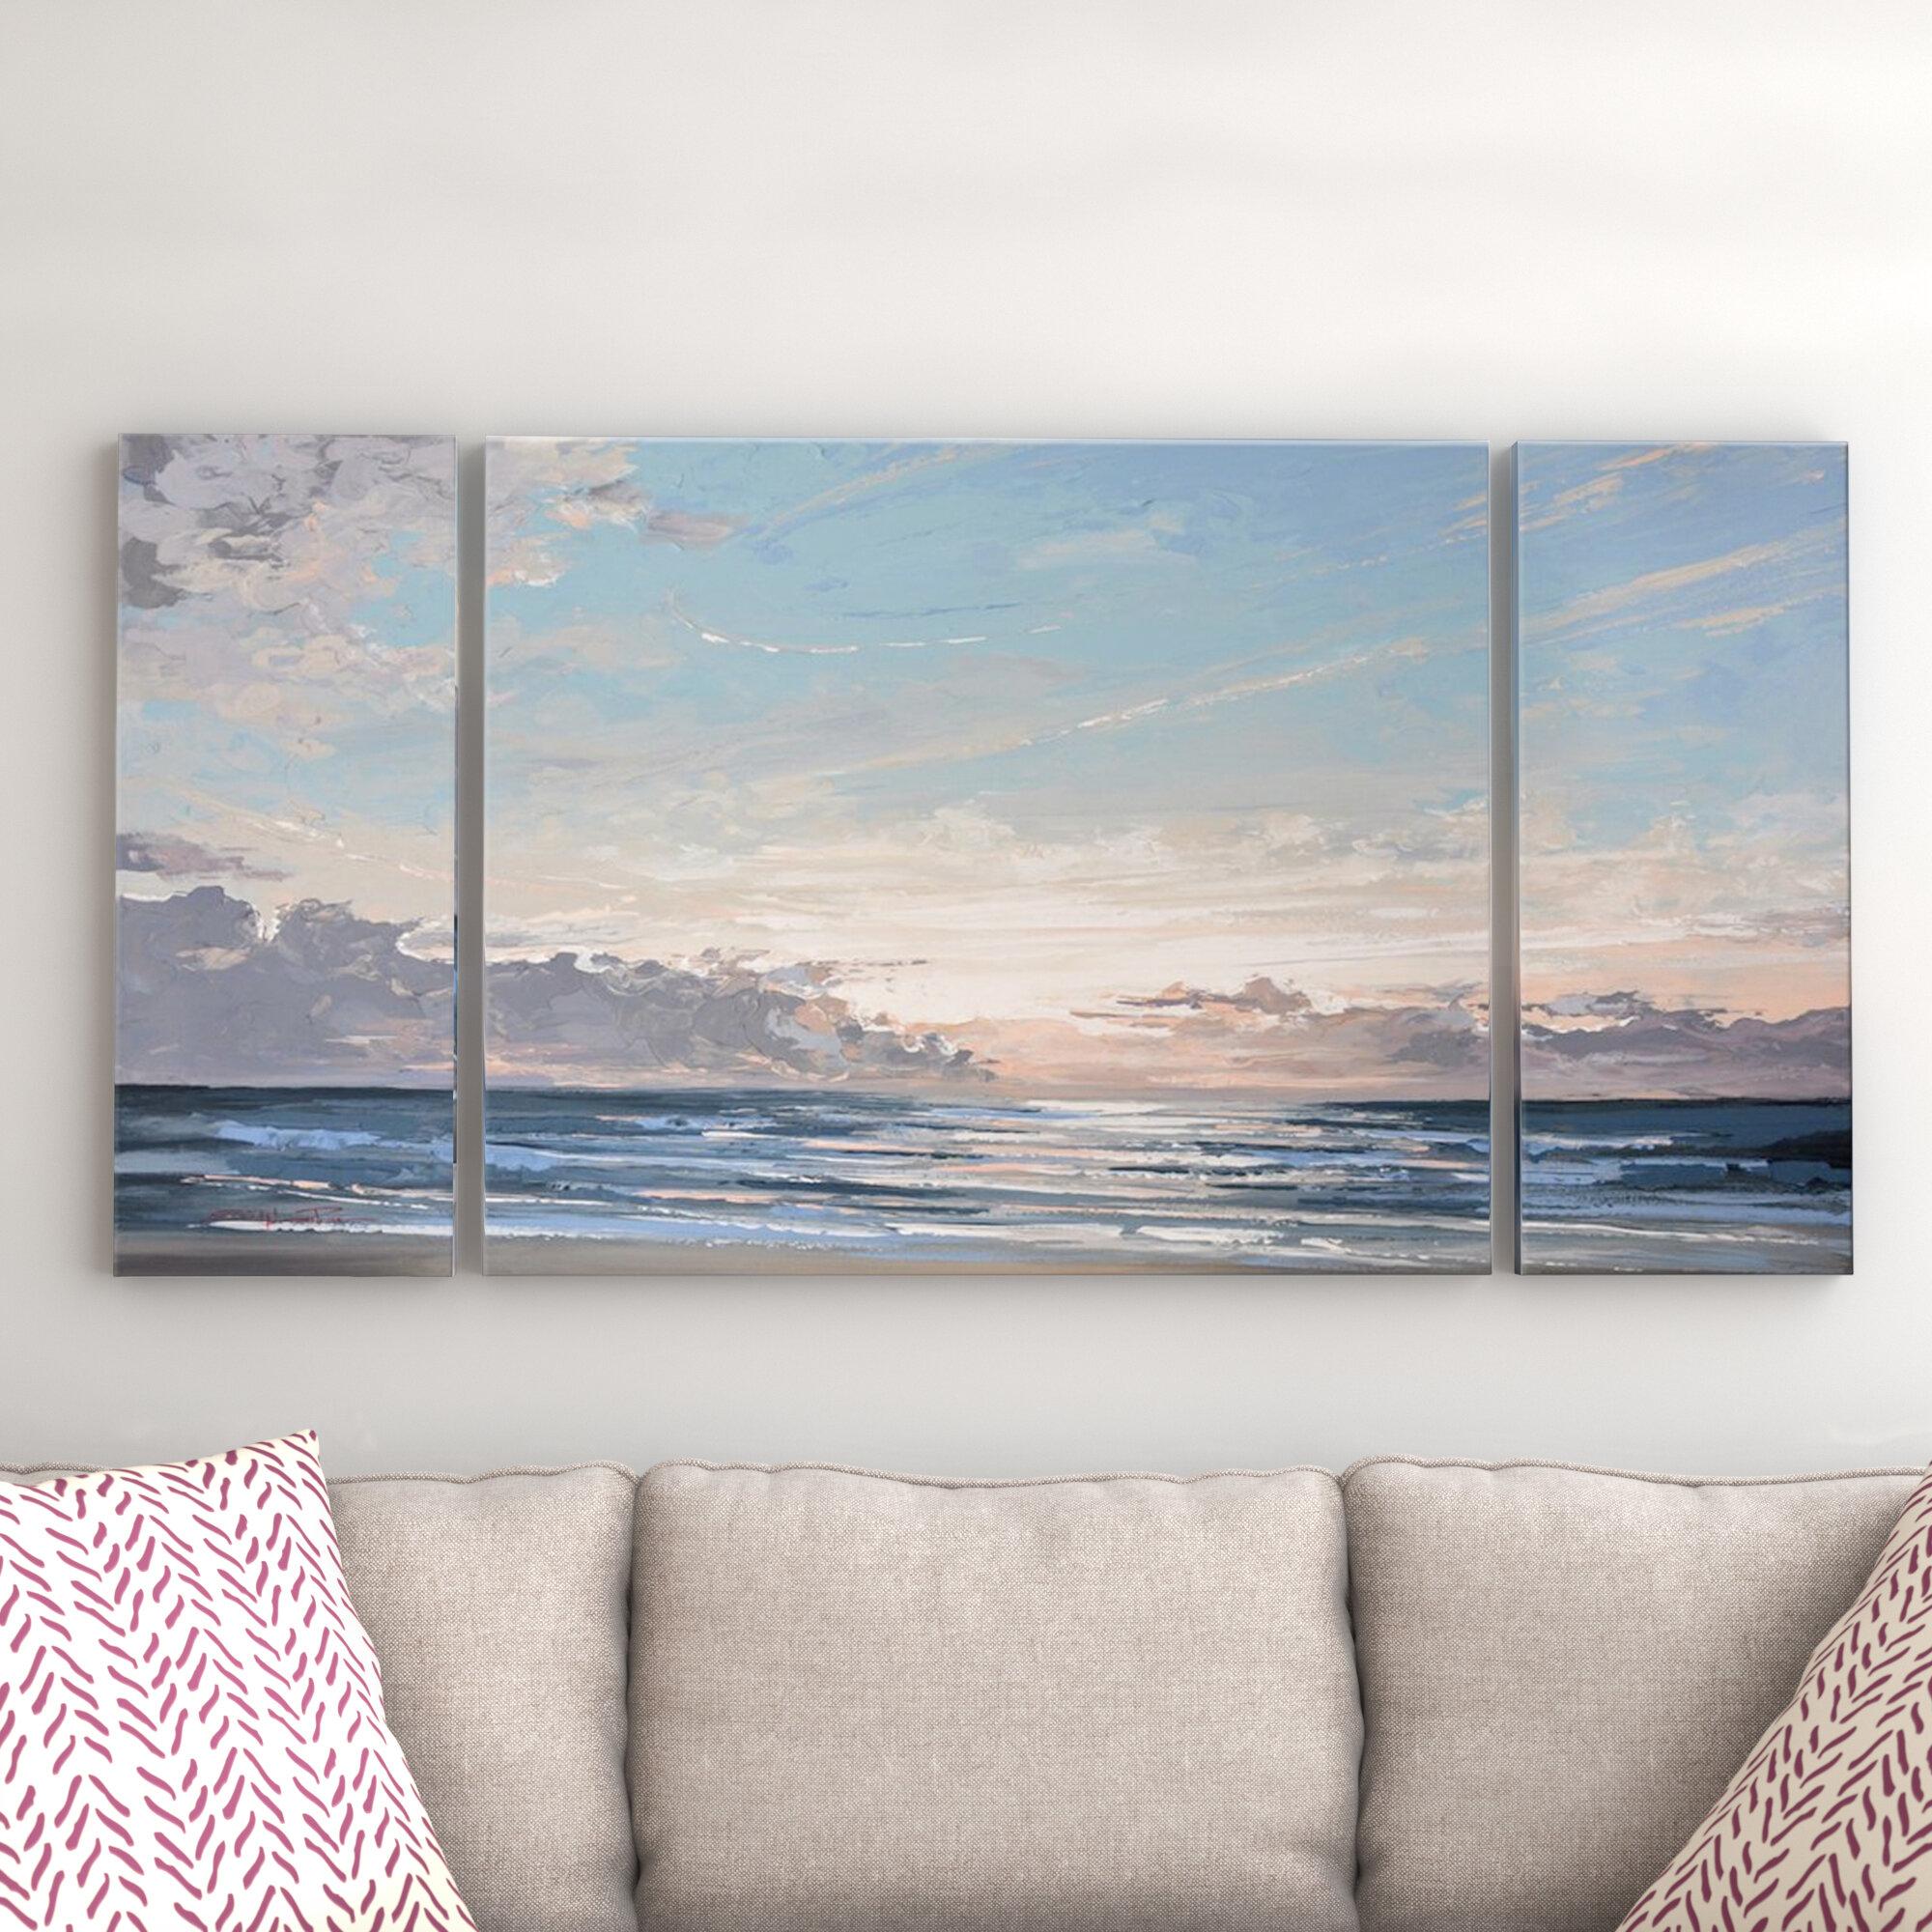 PURPLE LAVENDER BEACH SEA GLASS PRINT HOME WALL DECOR OUTLET COVER